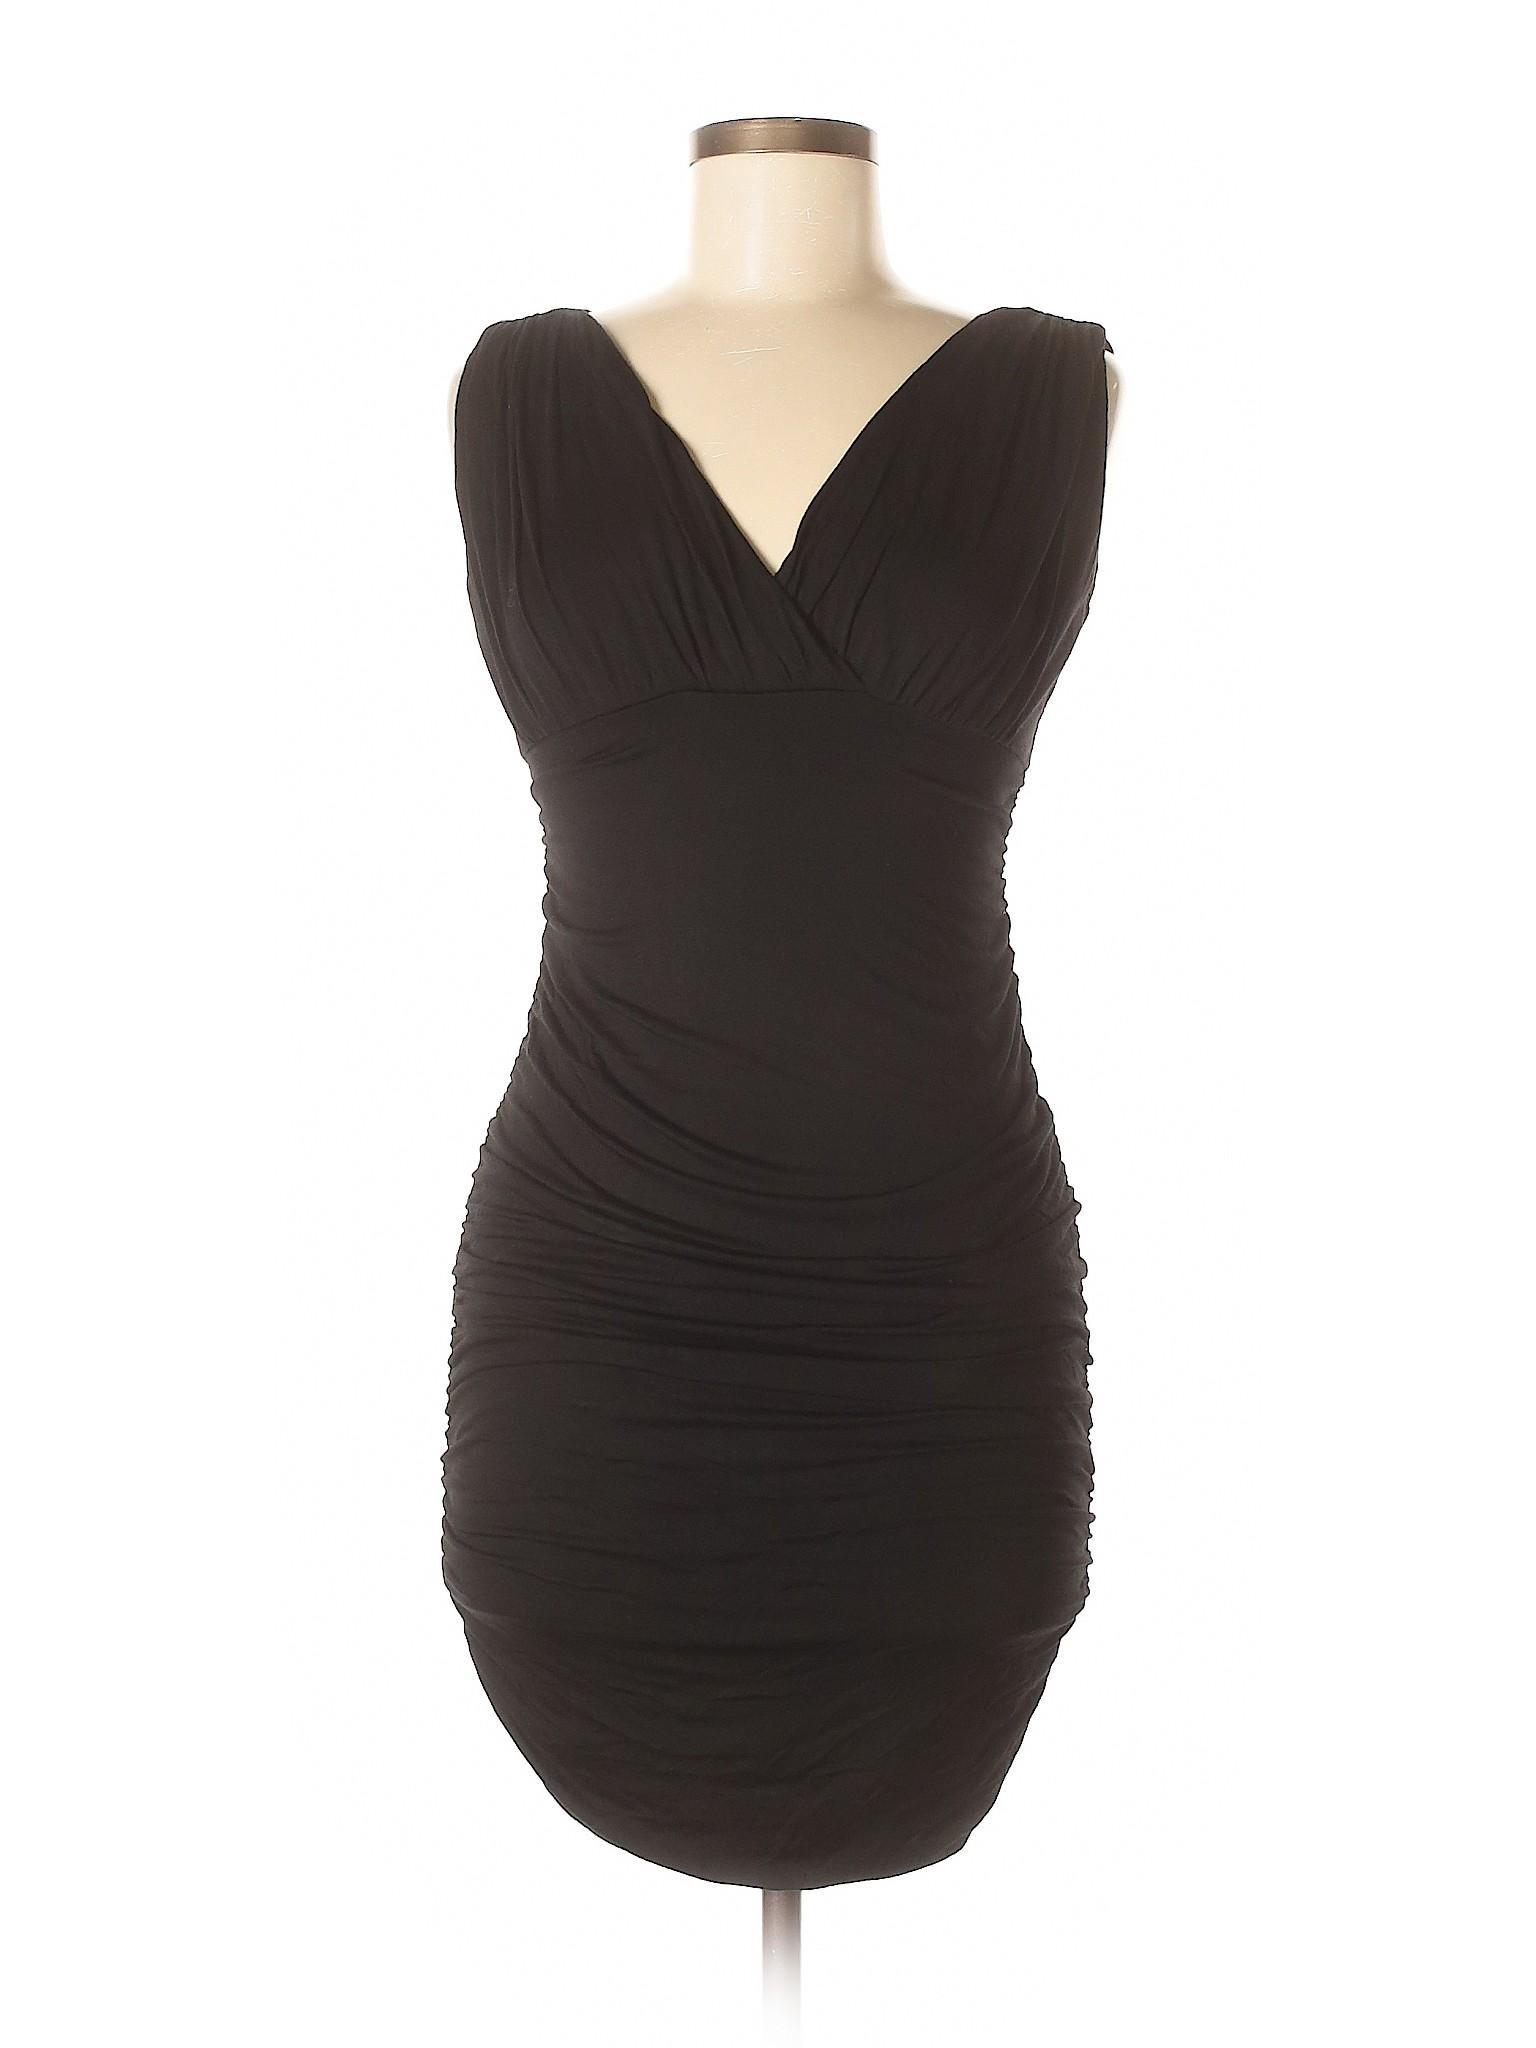 Boutique Weston winter Boutique Casual winter Dress qr8arvYn